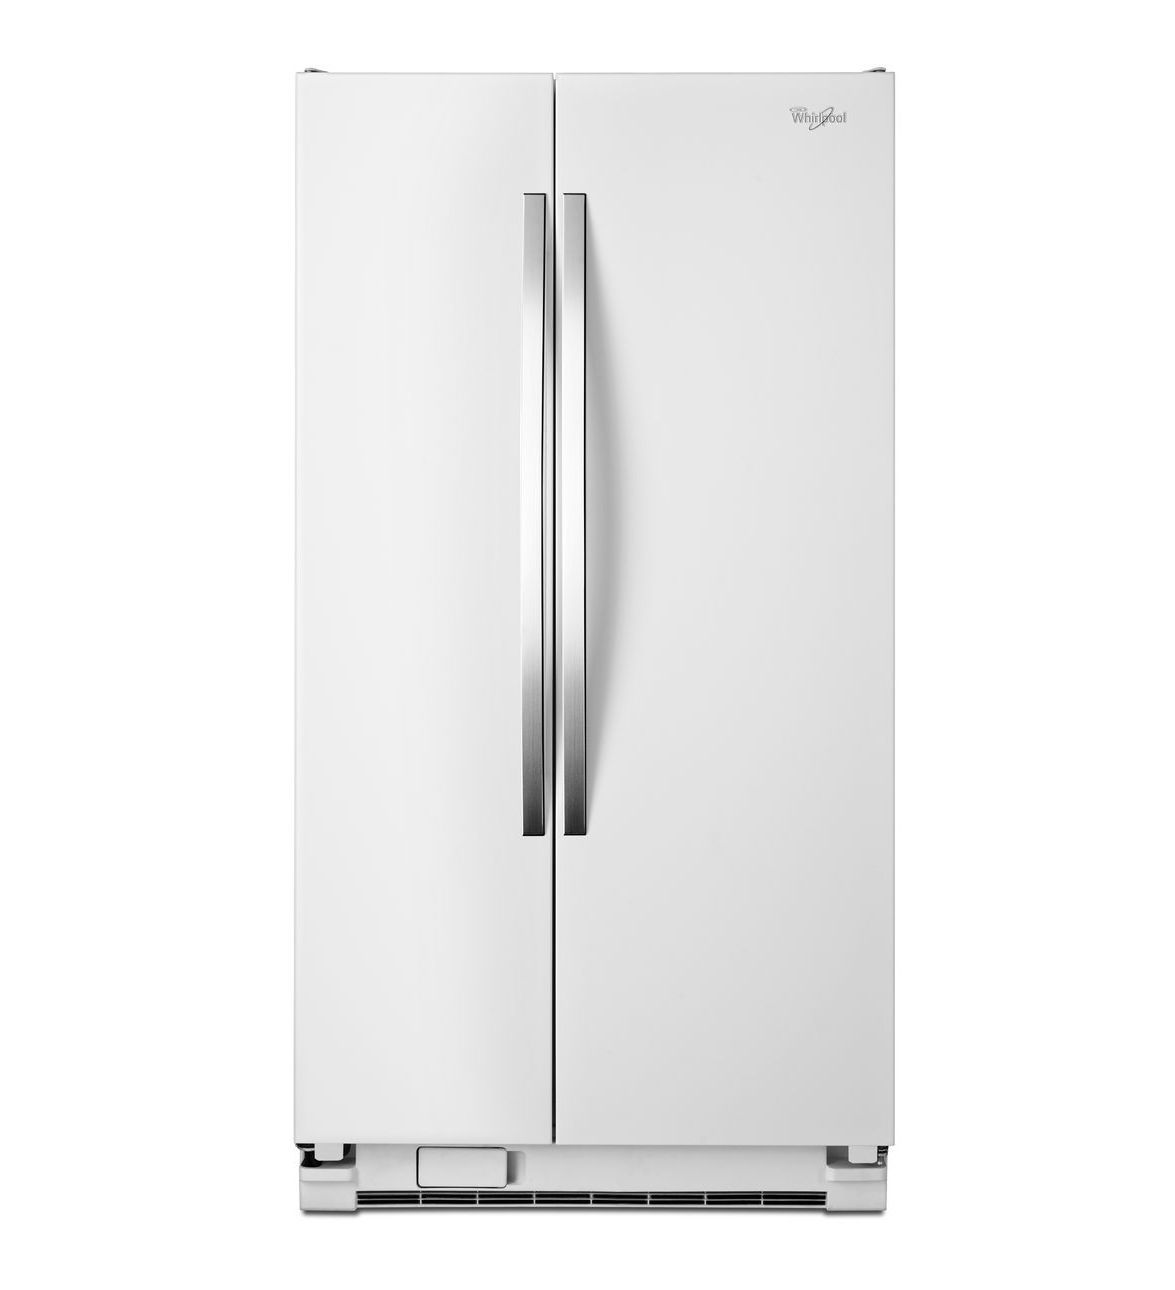 Whirlpool white ice refrigerator counter depth - Whirlpool White Ice Refrigerator Counter Depth